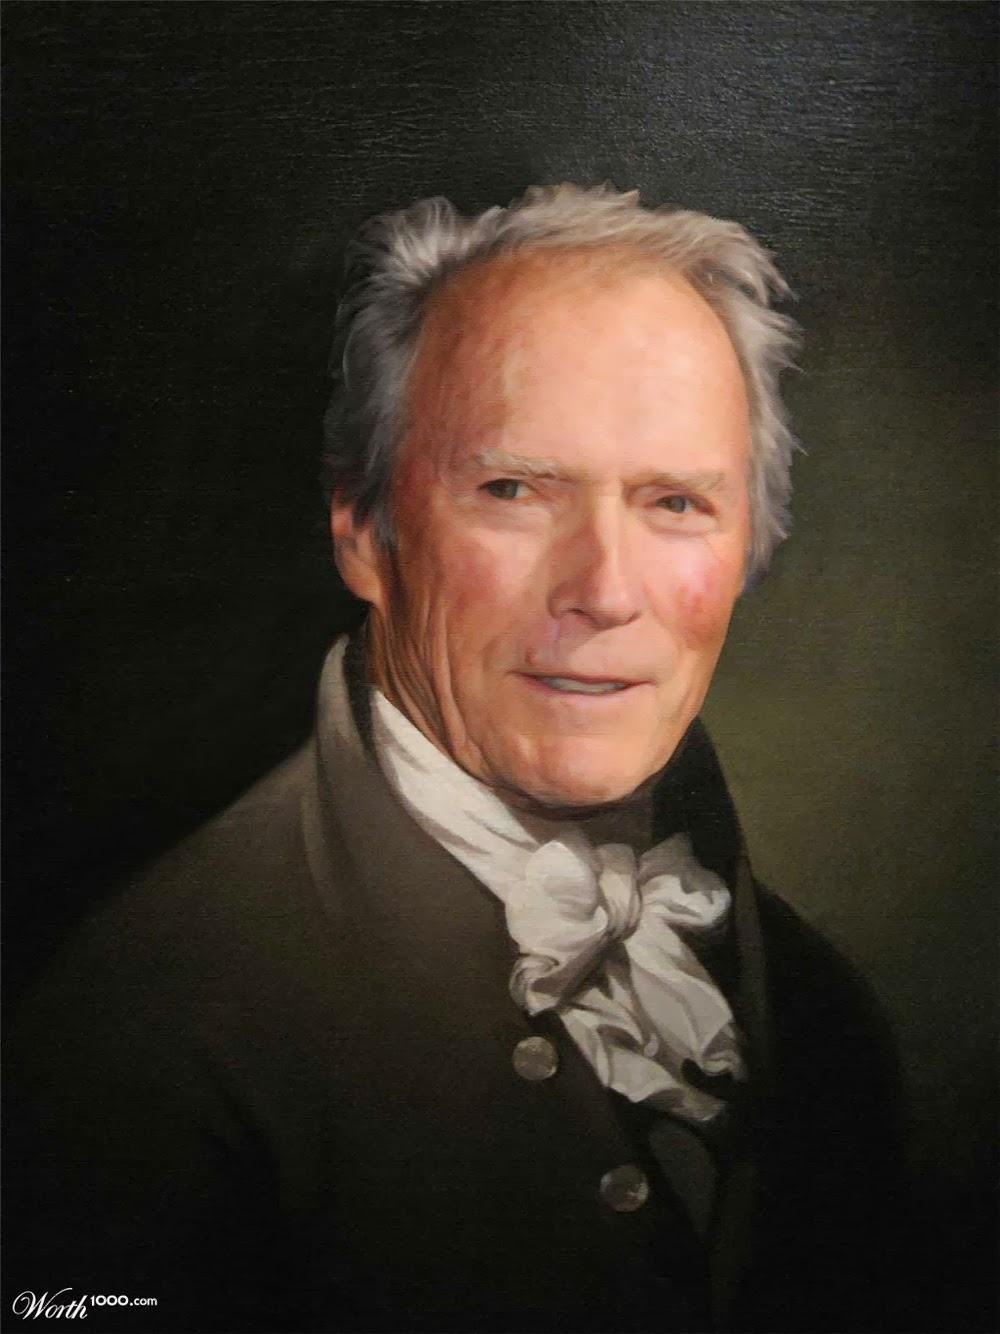 05-Clint-Eastwood-by-underworth-Worth-1000-www-designstack-co